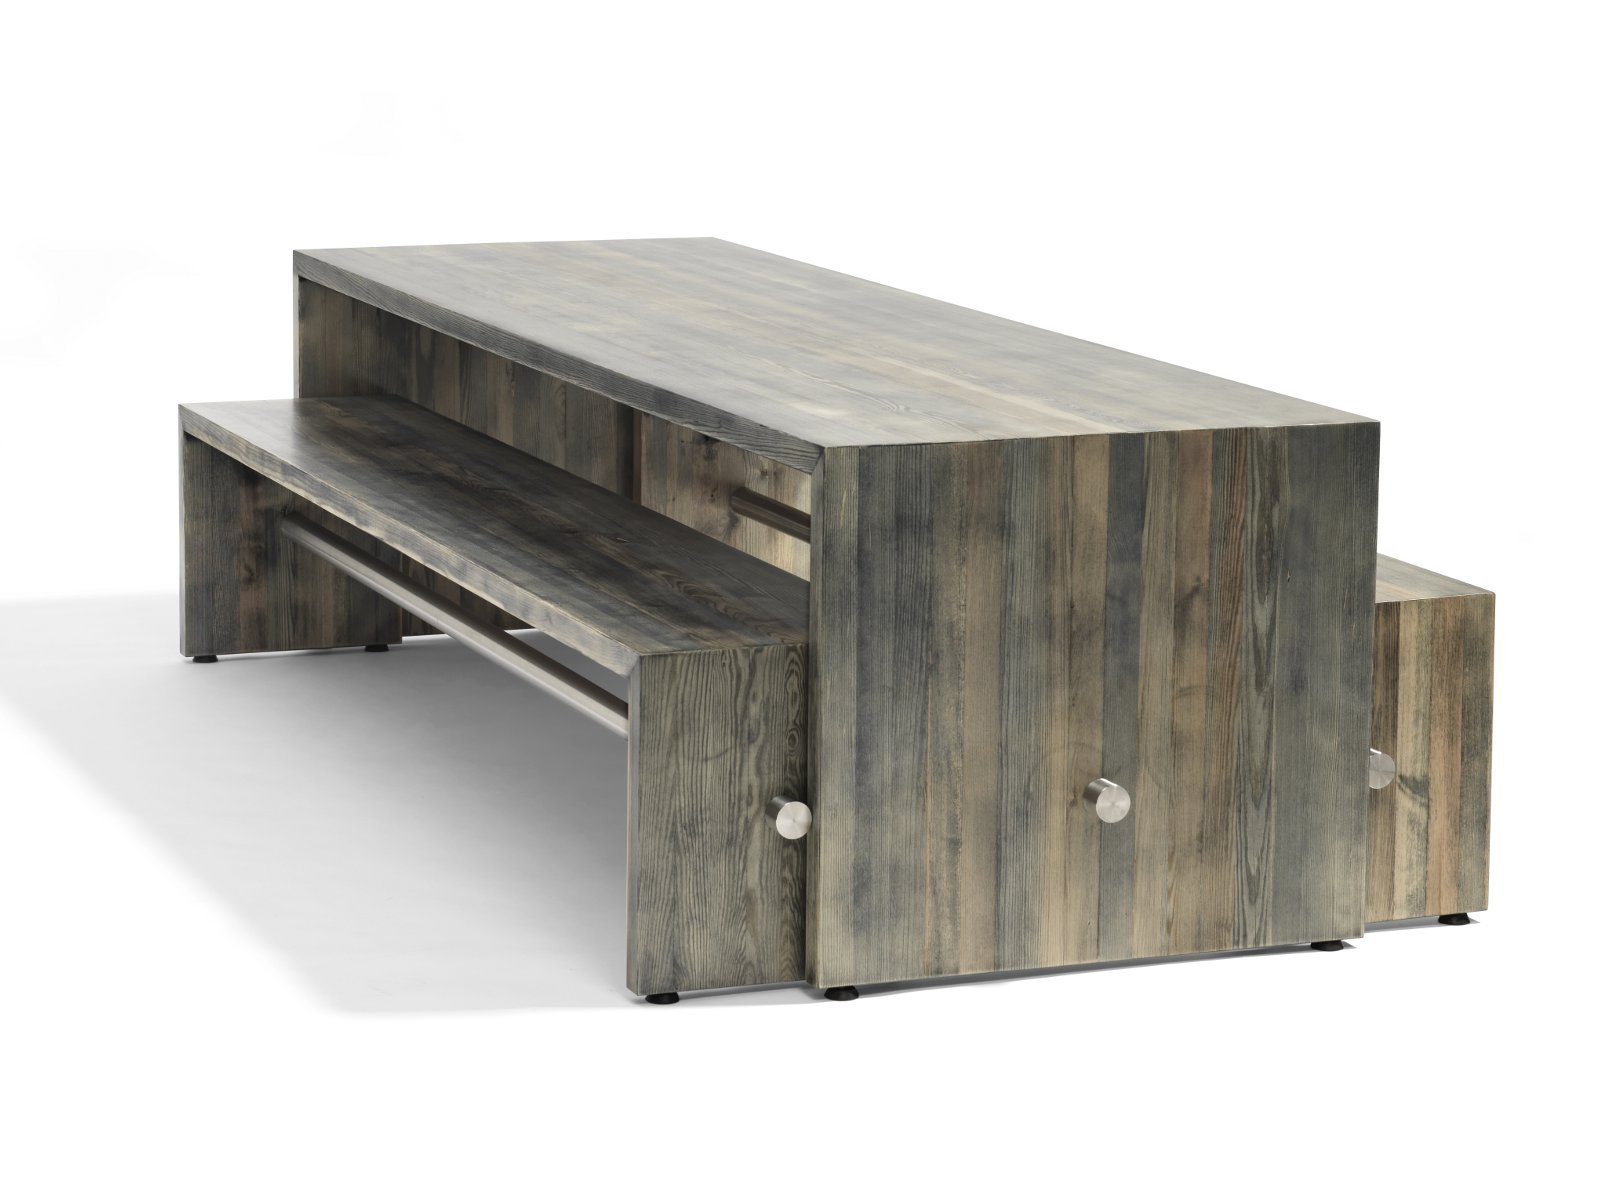 Ping pong tavolo by bl station design johan lindau Table de jardin avec banc attenant